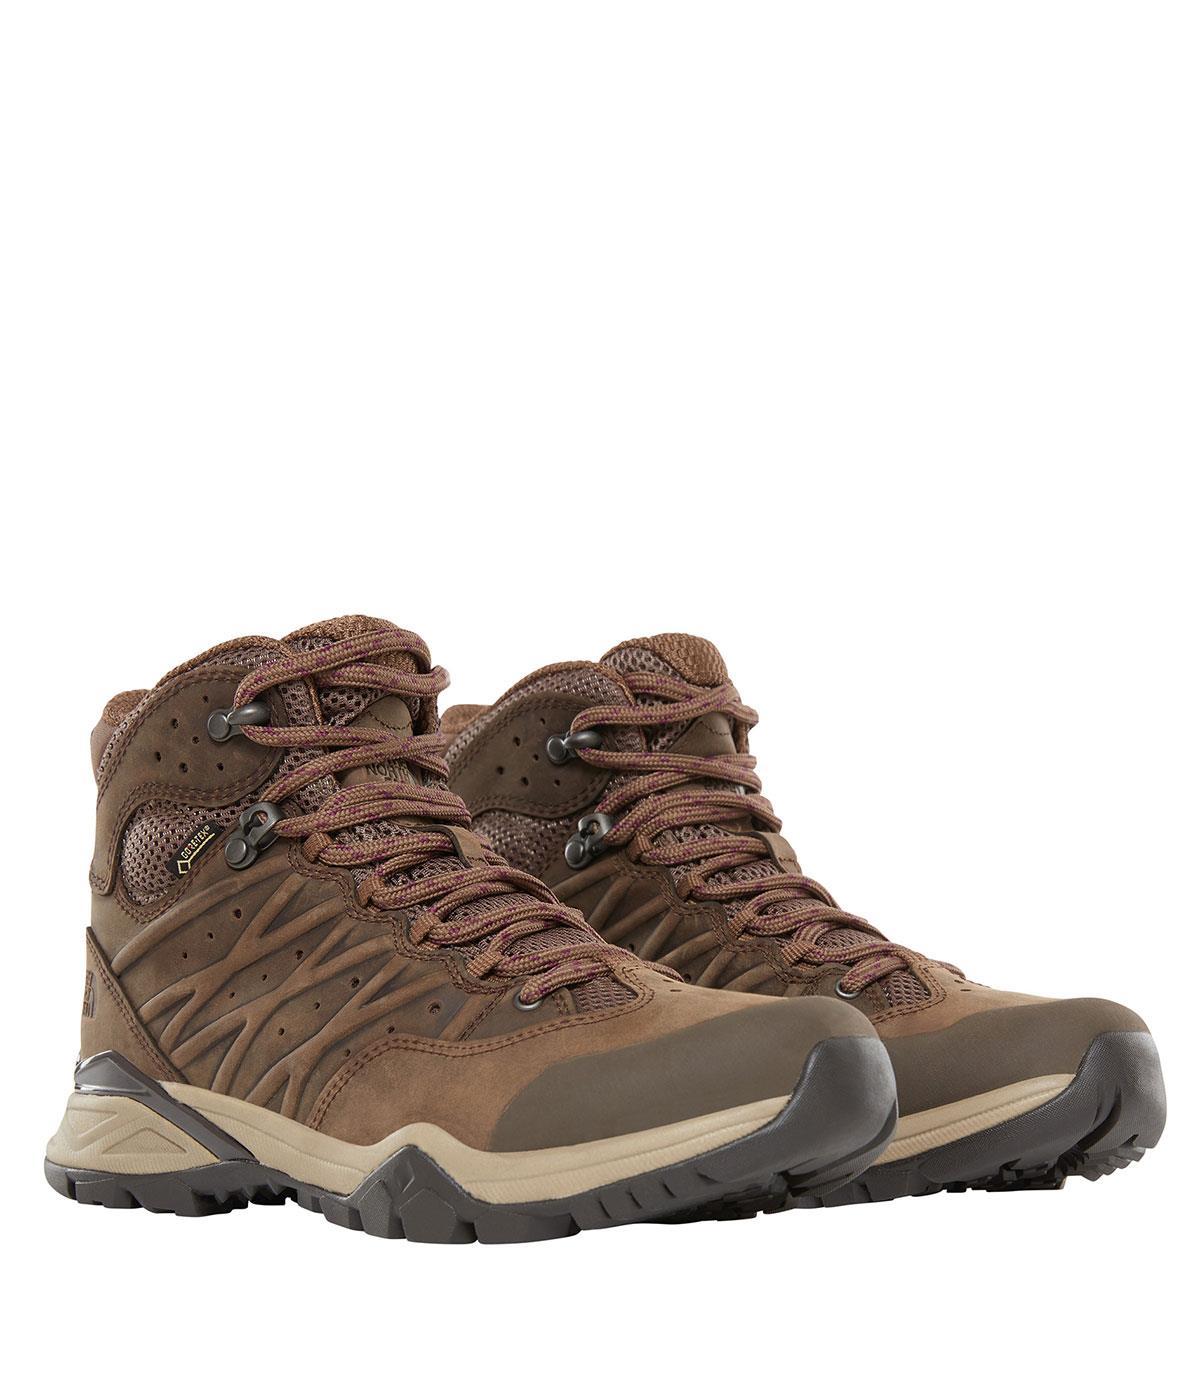 The North Face Kadın Hh Hike İi Md Gtx Nf0A39İagsq1 Ayakkabı